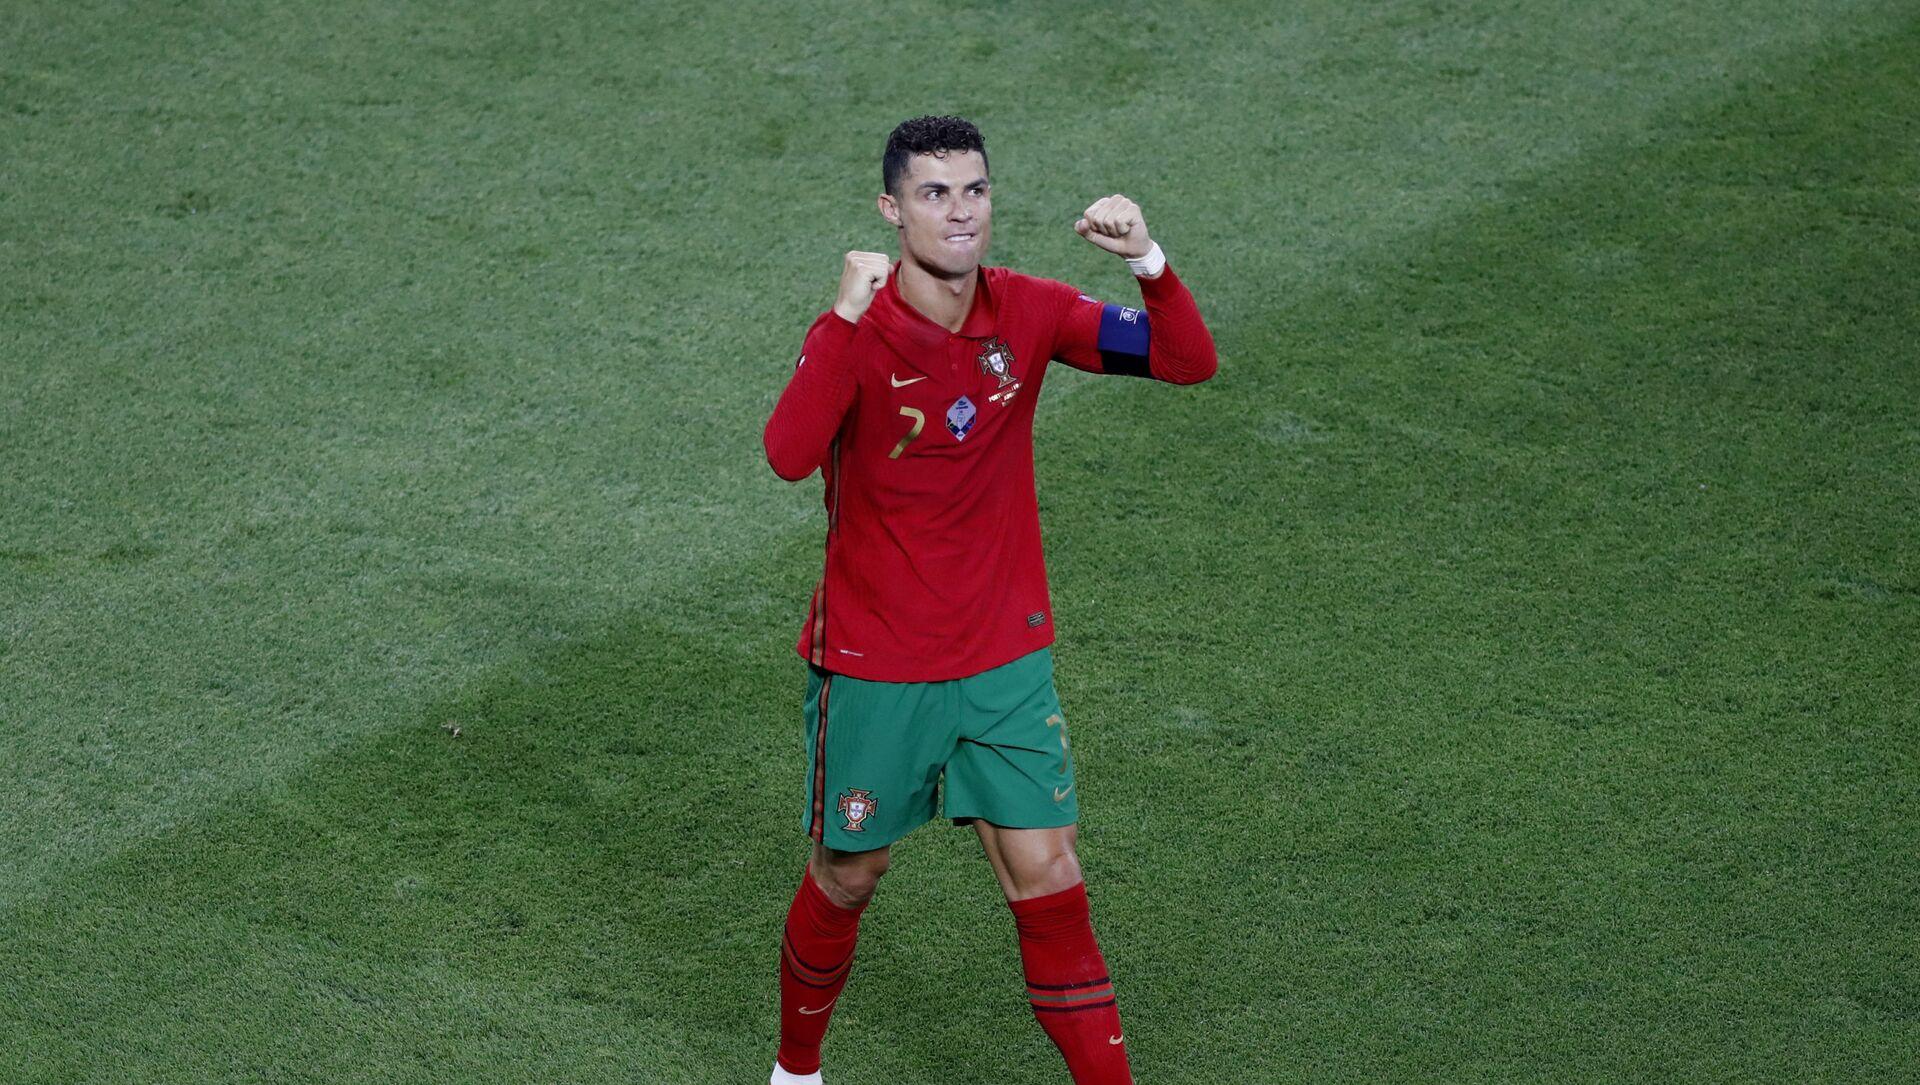 Soccer Football - Euro 2020 - Group F - Portugal v France - Puskas Arena, Budapest, Hungary - June 23, 2021 Portugal's Cristiano Ronaldo celebrates scoring their first goal  - Sputnik International, 1920, 03.08.2021